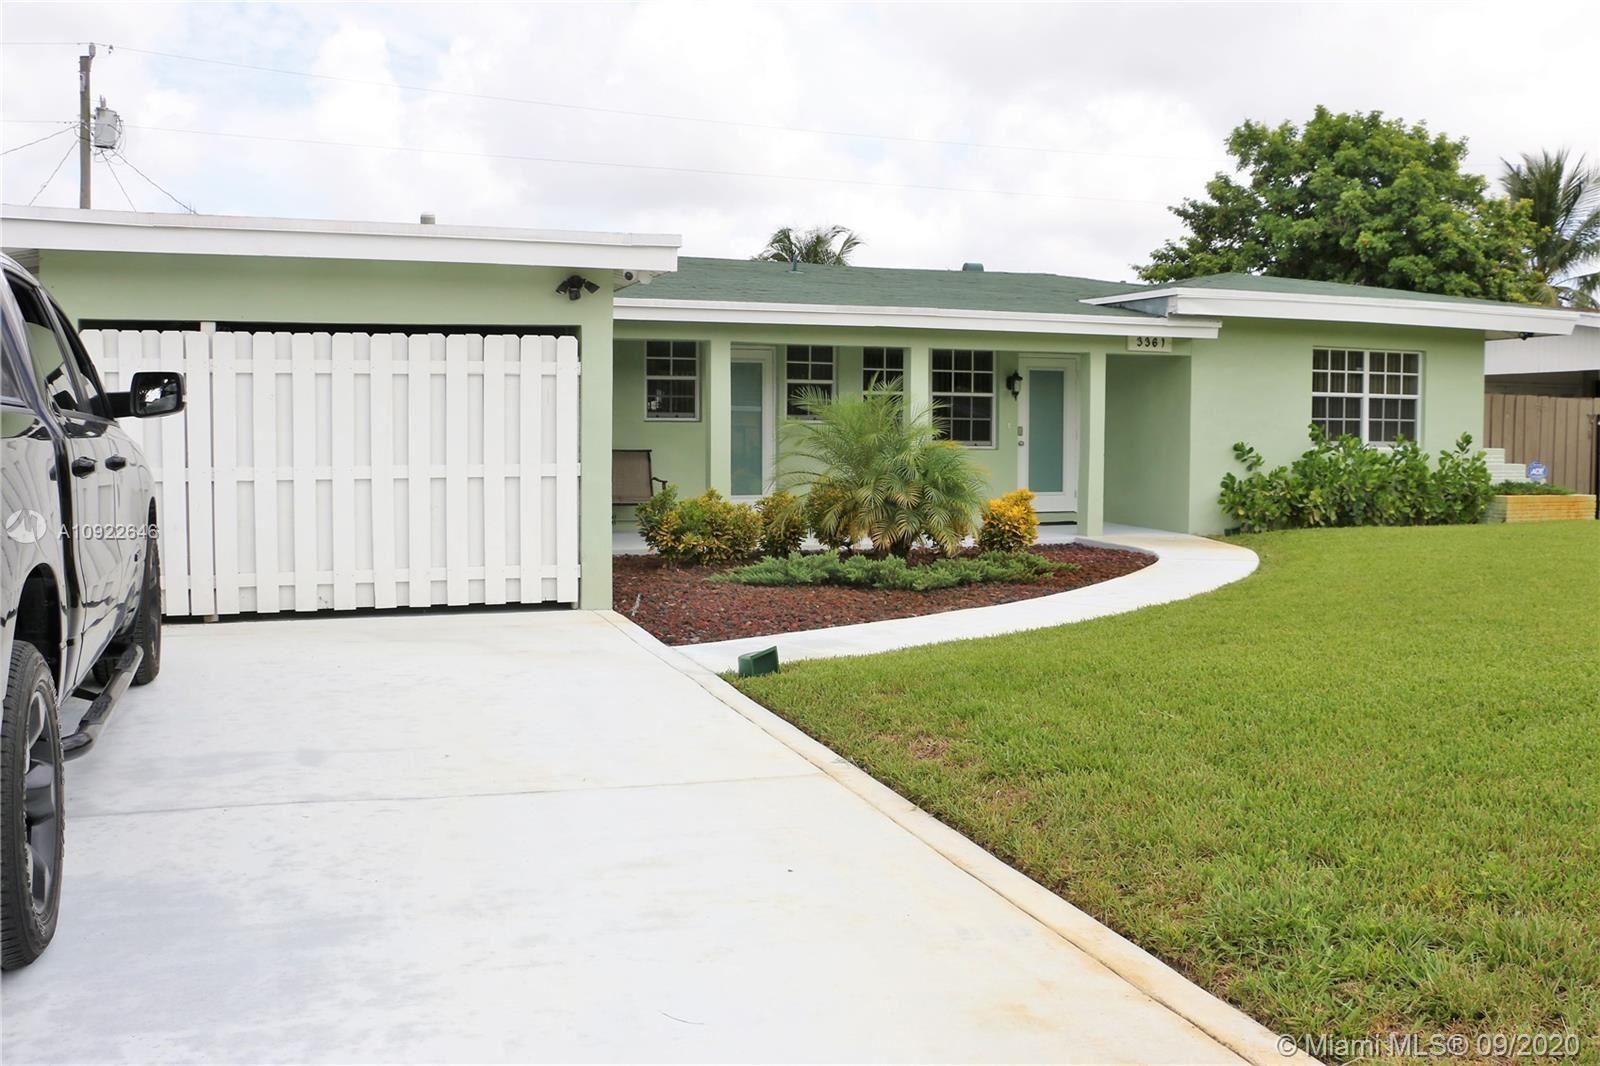 3361 Jackson Blvd, Fort Lauderdale, FL 33312 - #: A10922646